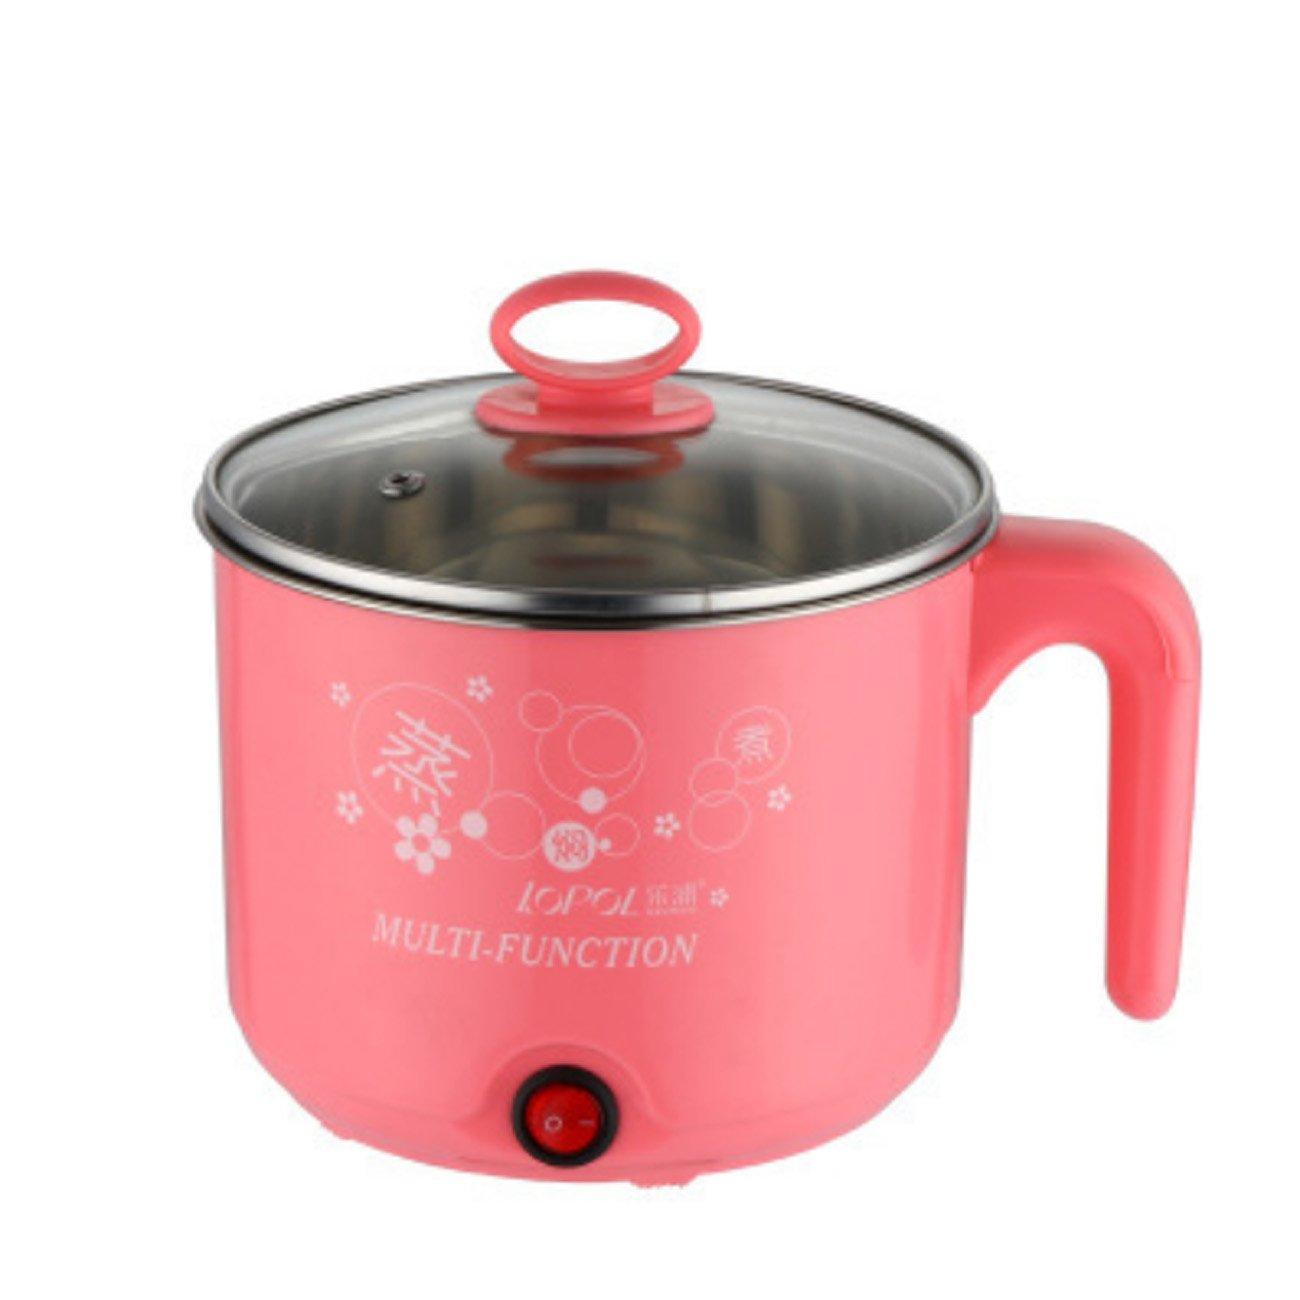 ZXMXY Multifunktionale Elektroherd Mini elektrische Hot Pot Schlafsaal Student Kochtopf Edelstahl Doppel Ei Steamer Gemüse Steamer zum Kochen nach Hause (Capacity : With steamer, Color : Blue)